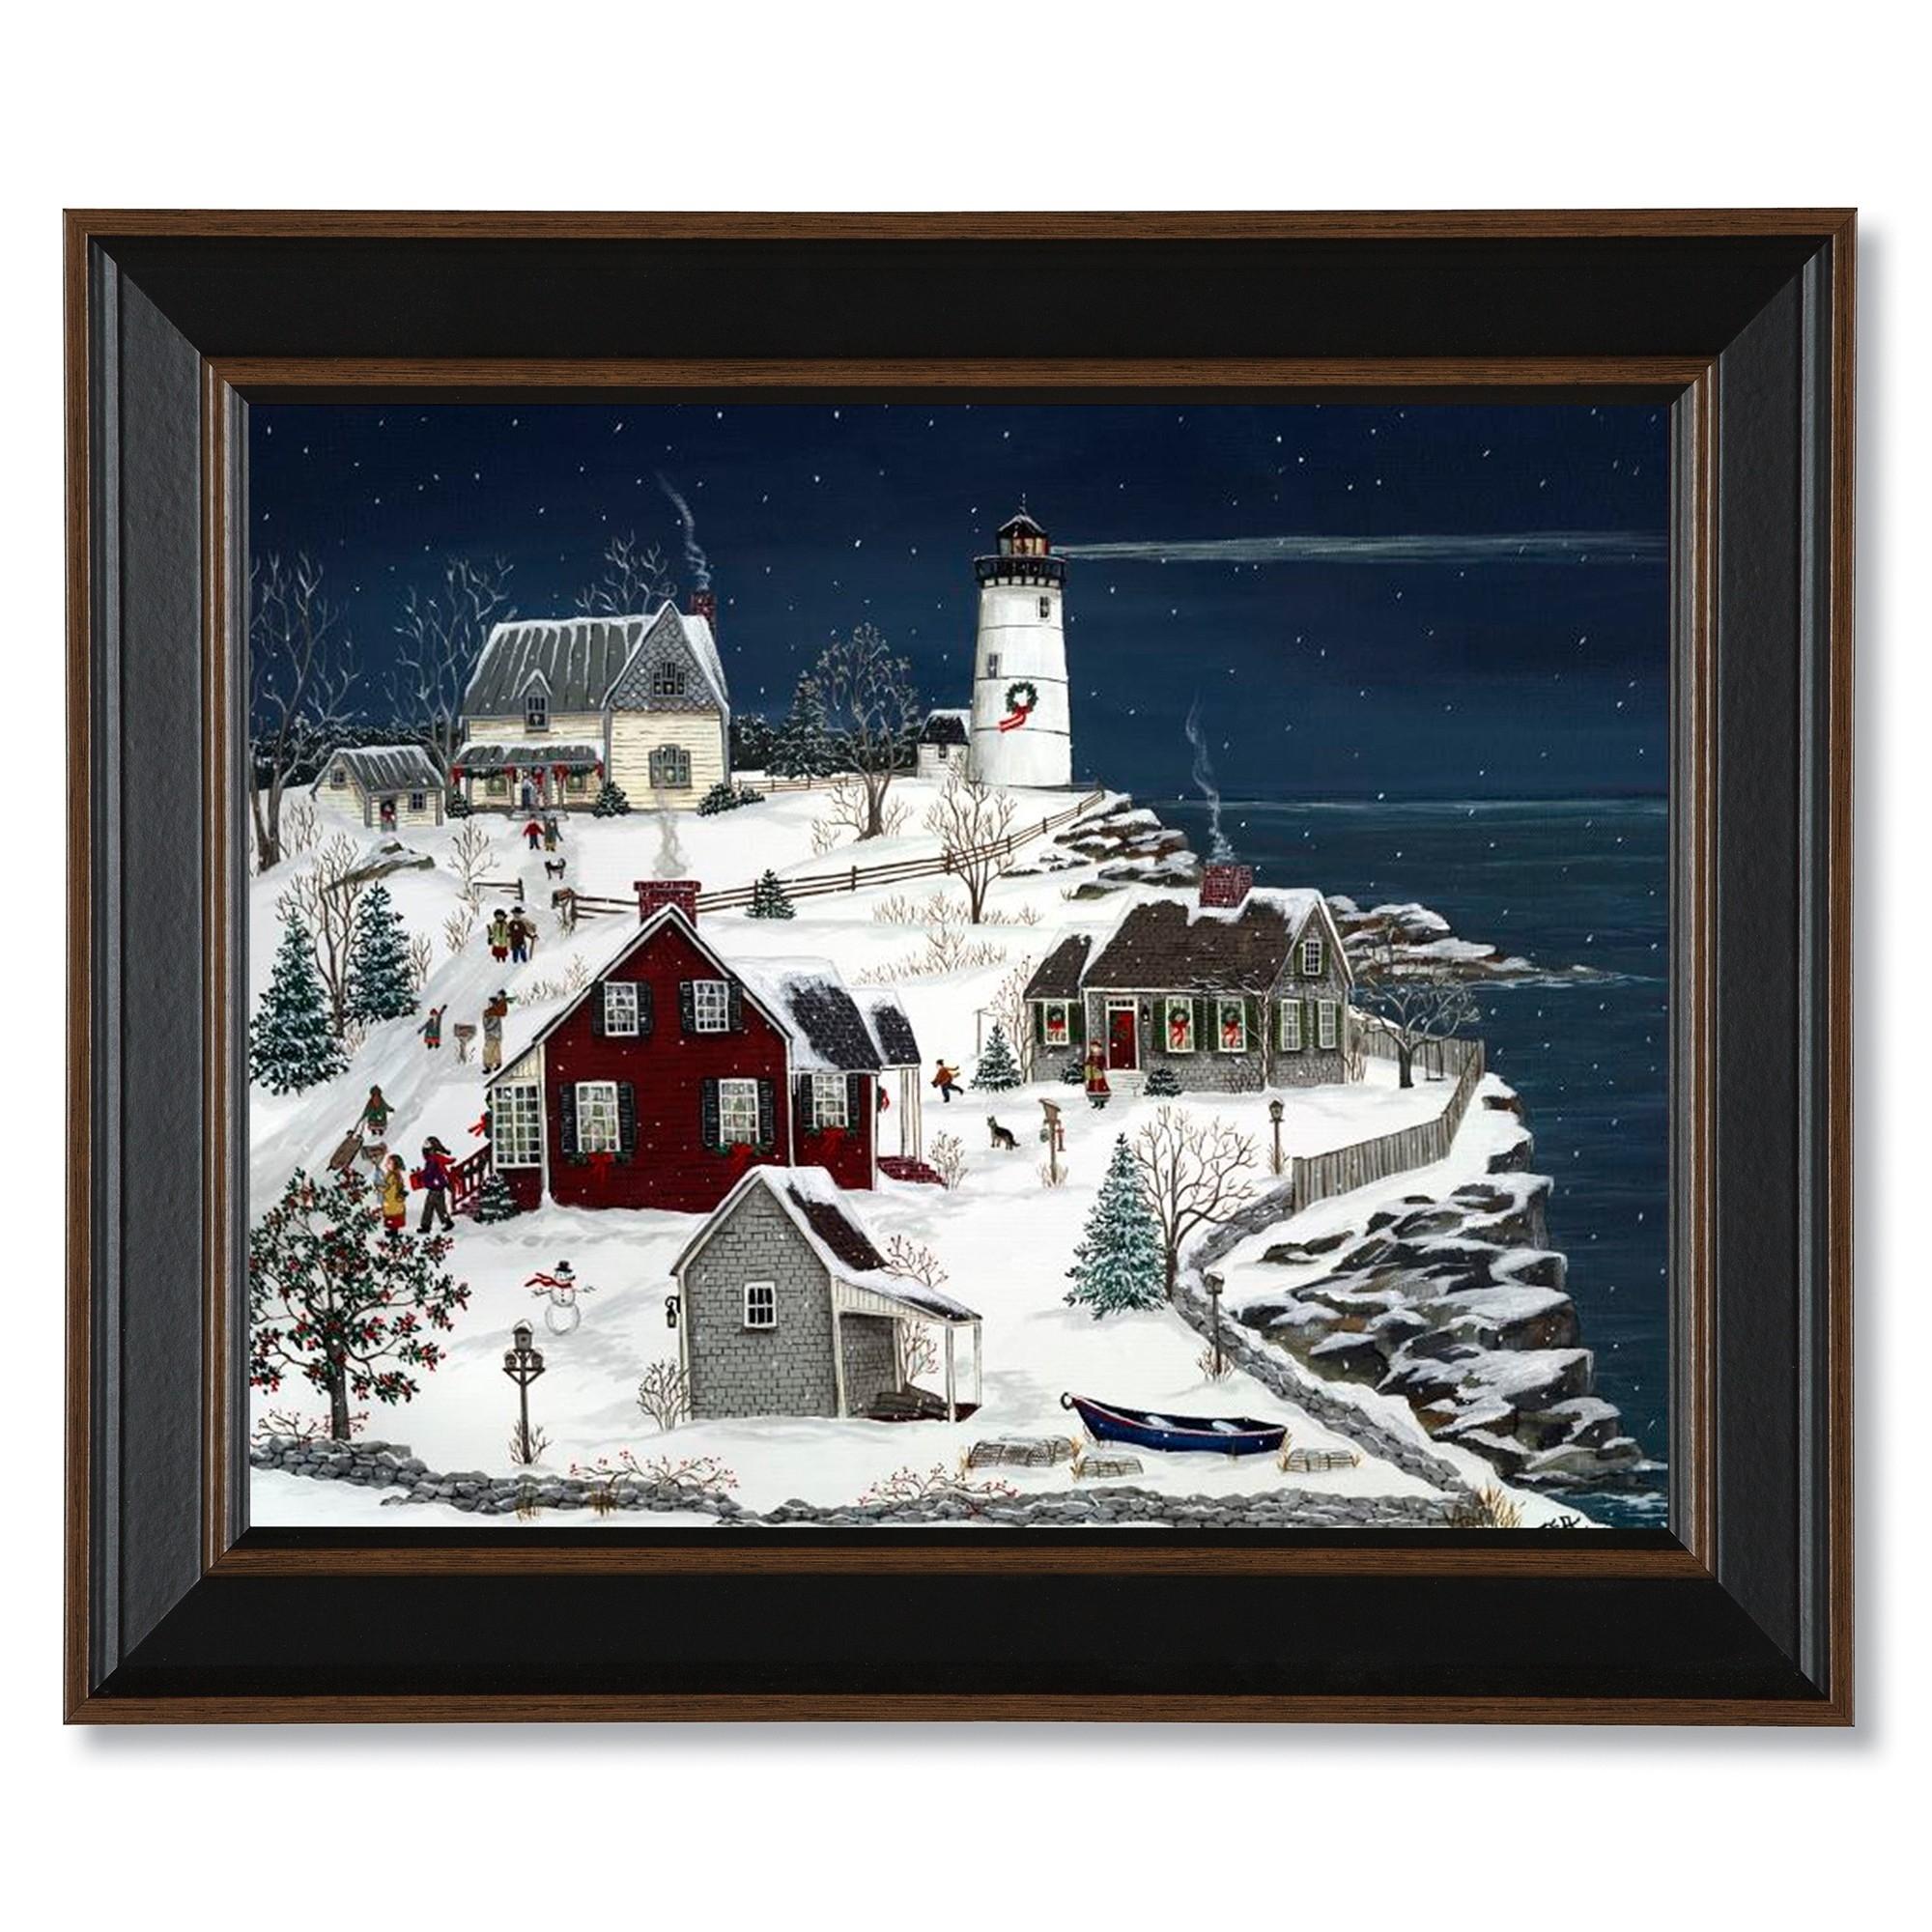 Seasonal | Prints & Wall Art | Wall Decor | Sturbridge Yankee Workshop In 2017 Christmas Framed Art Prints (View 6 of 15)